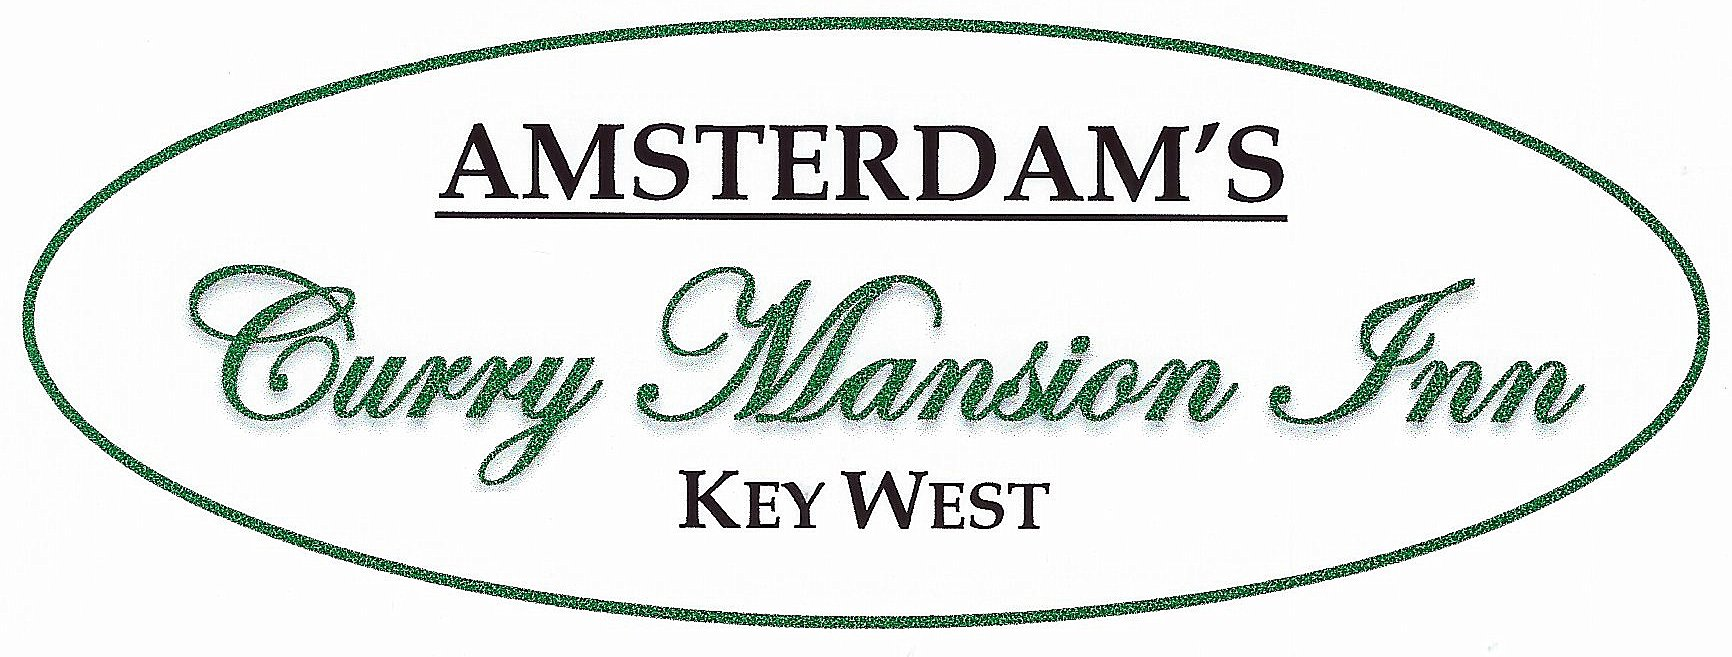 https://fkspca.org/wp-content/uploads/2020/11/Curry-Mansion-Inn.jpg